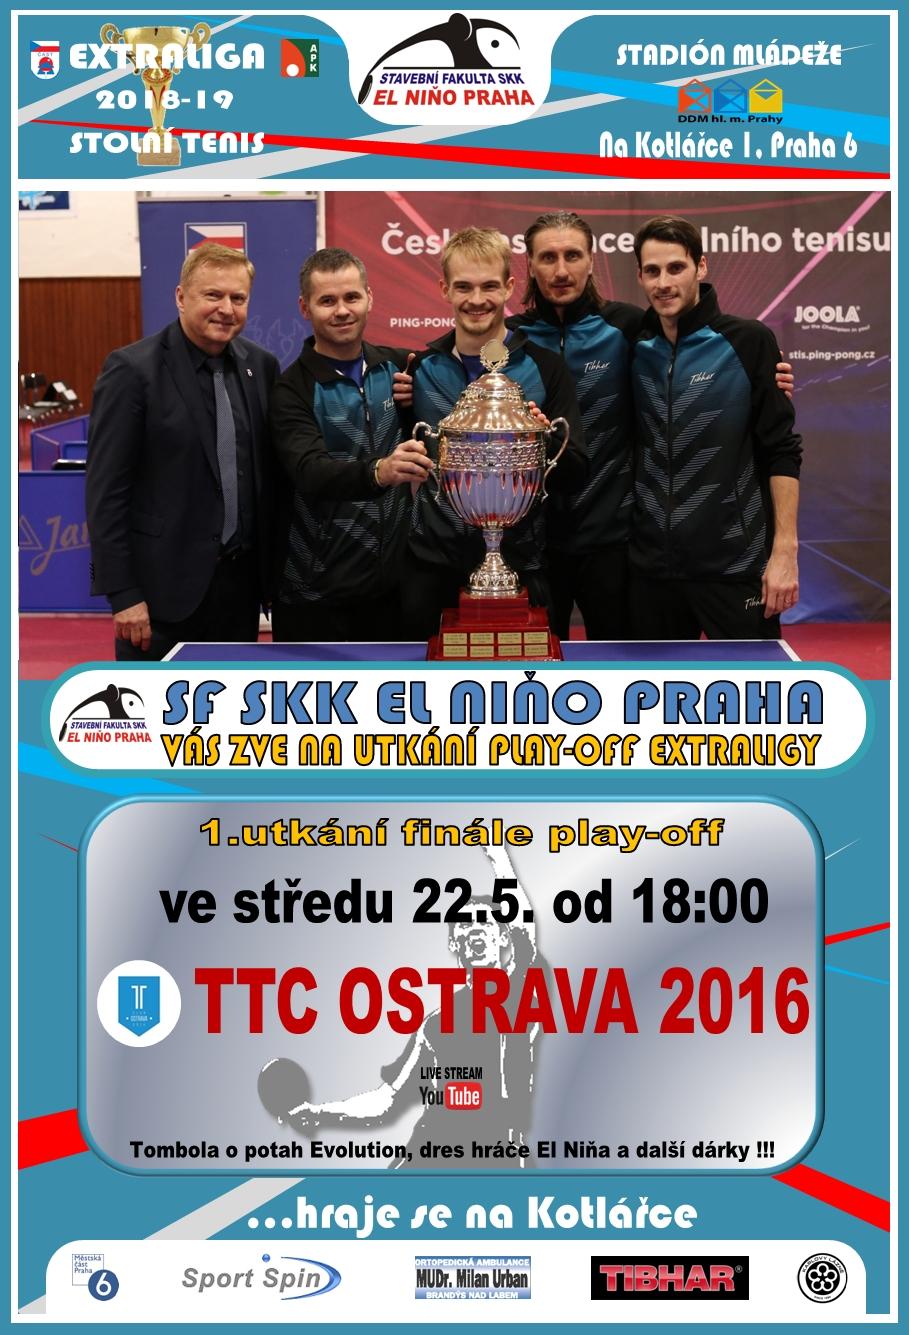 http://www.elninopraha.cz/wp-content/uploads/2019/05/finEN-TTC.jpg